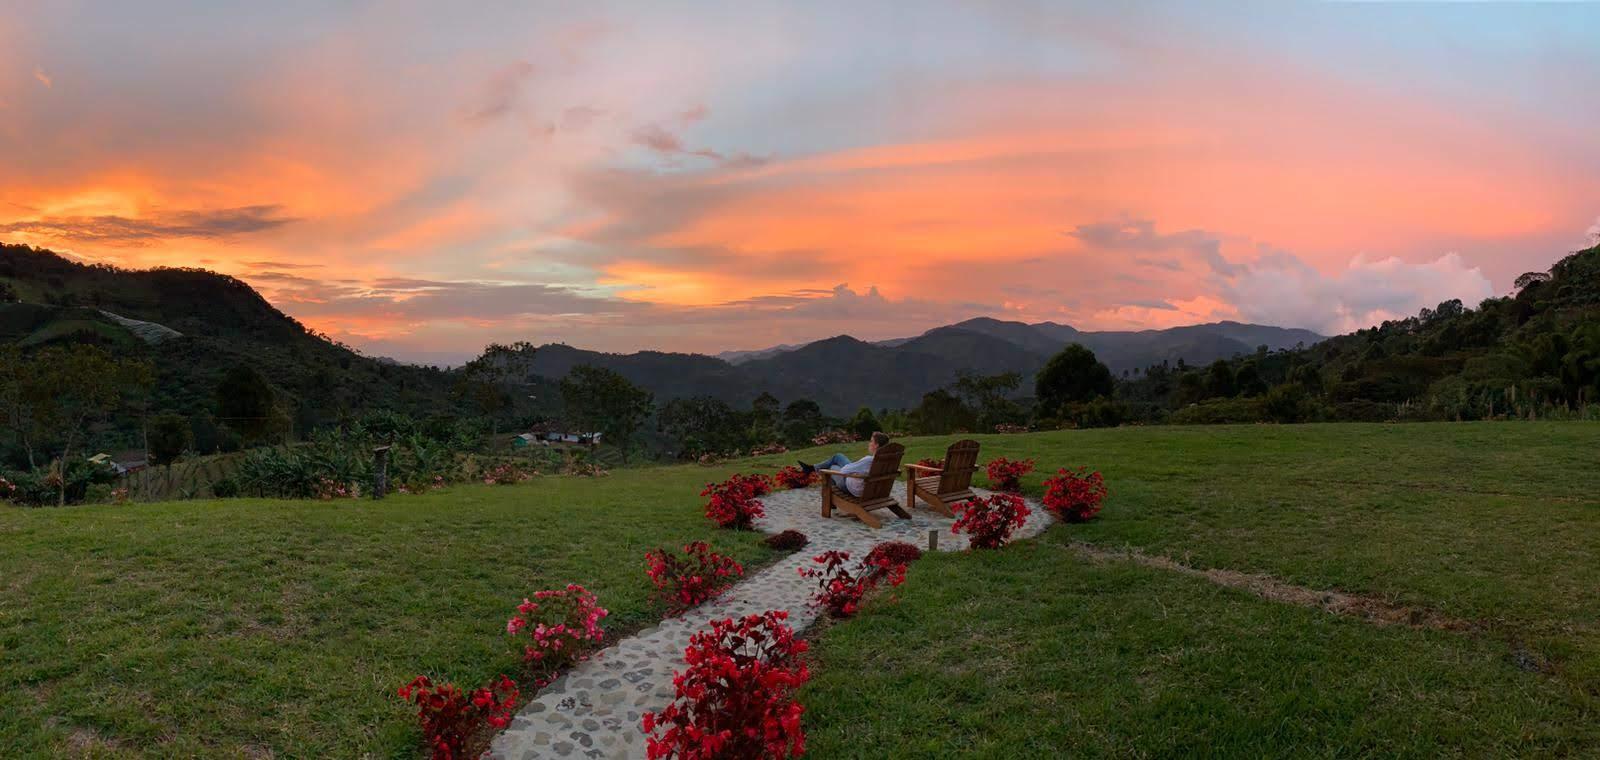 Sunset view at Finca Mariposa